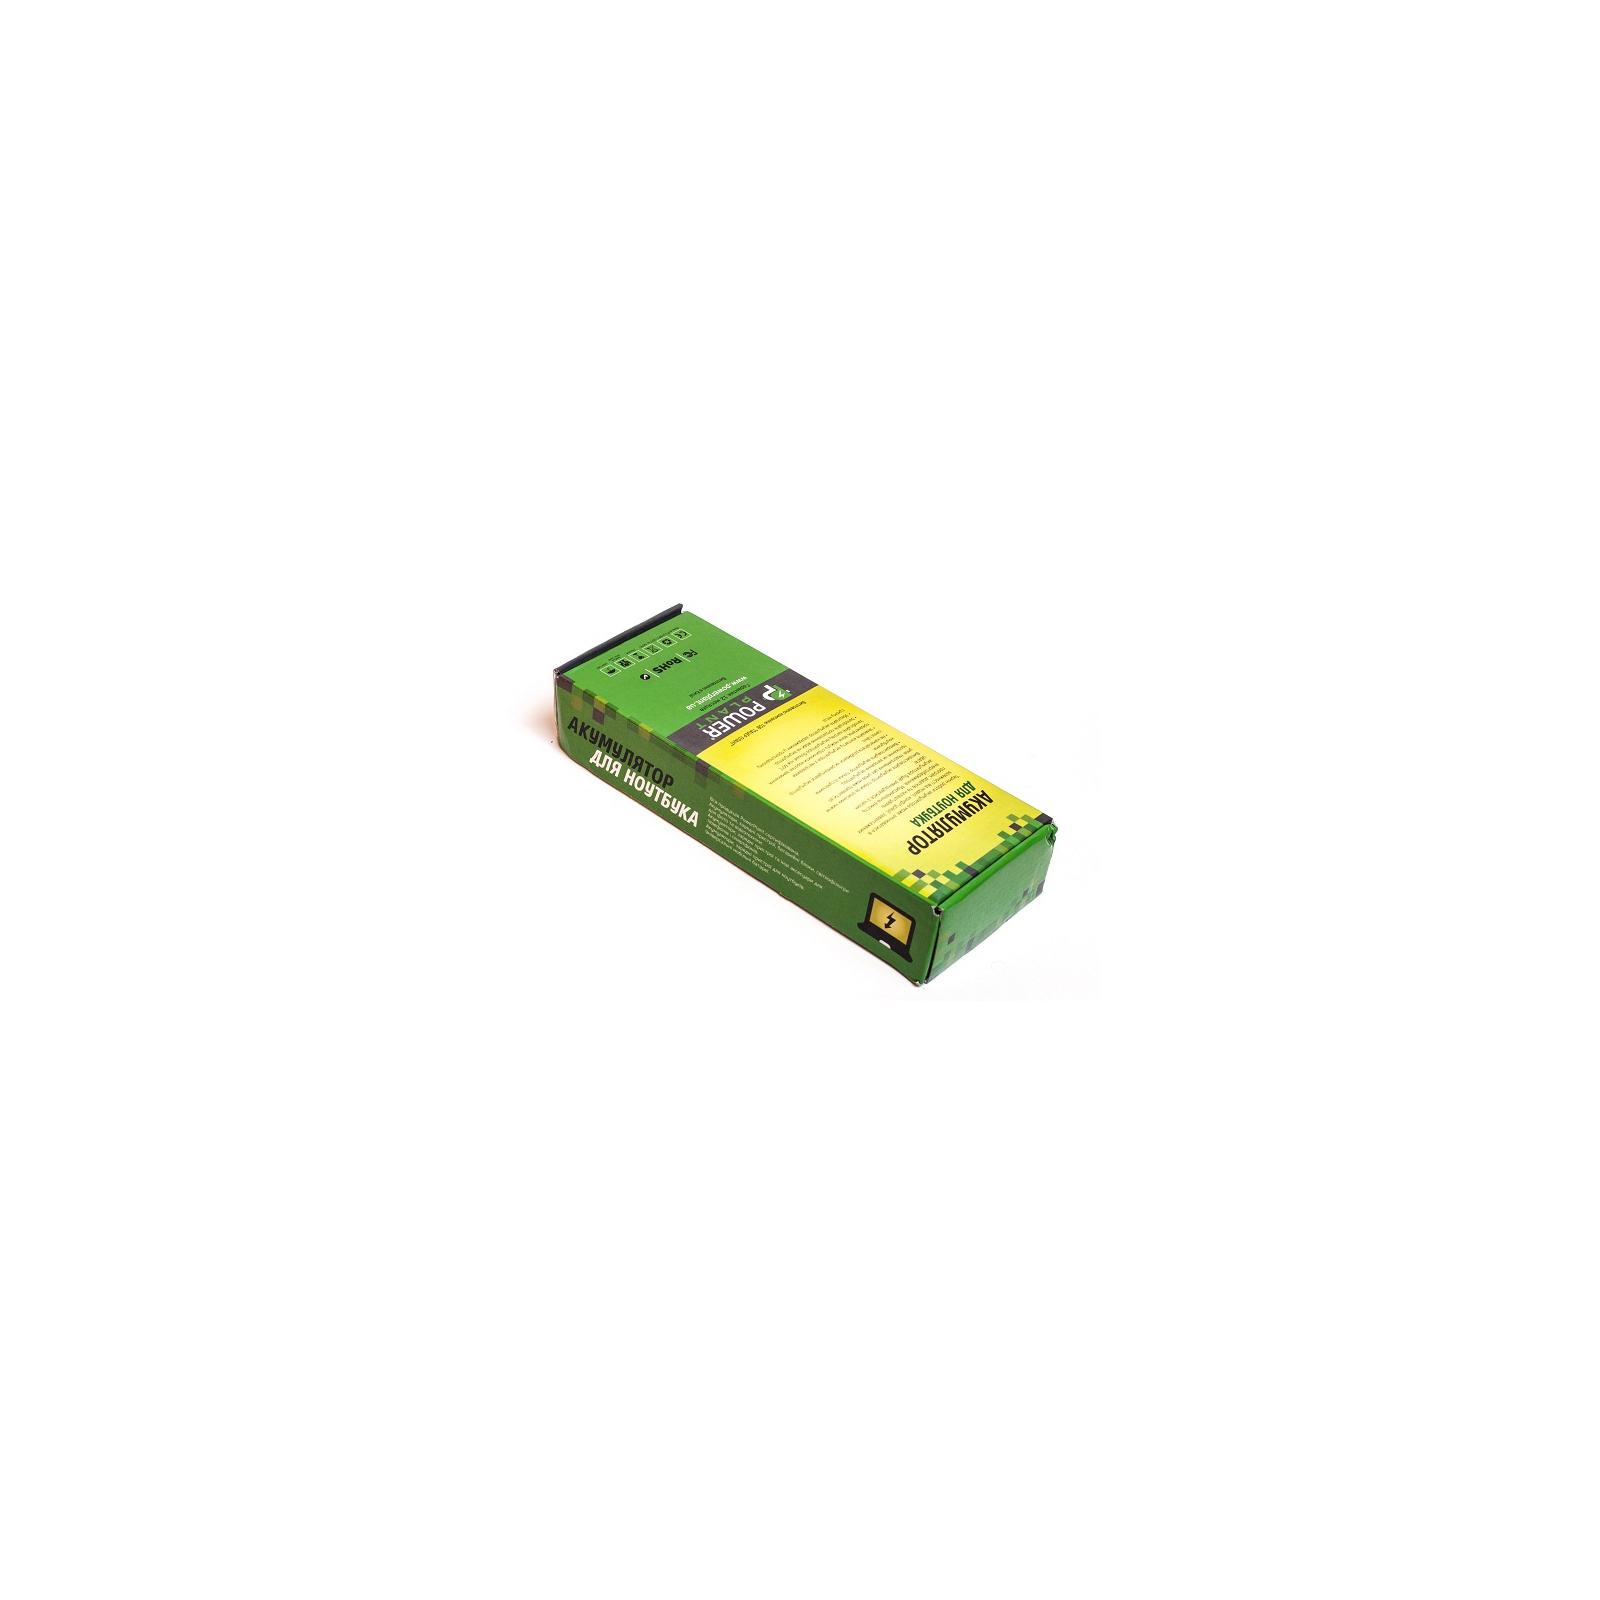 Аккумулятор для ноутбука DELL Latitude E5400 (KM742, DLE5400LH) 11.1V 6600mAh PowerPlant (NB00000147) изображение 2